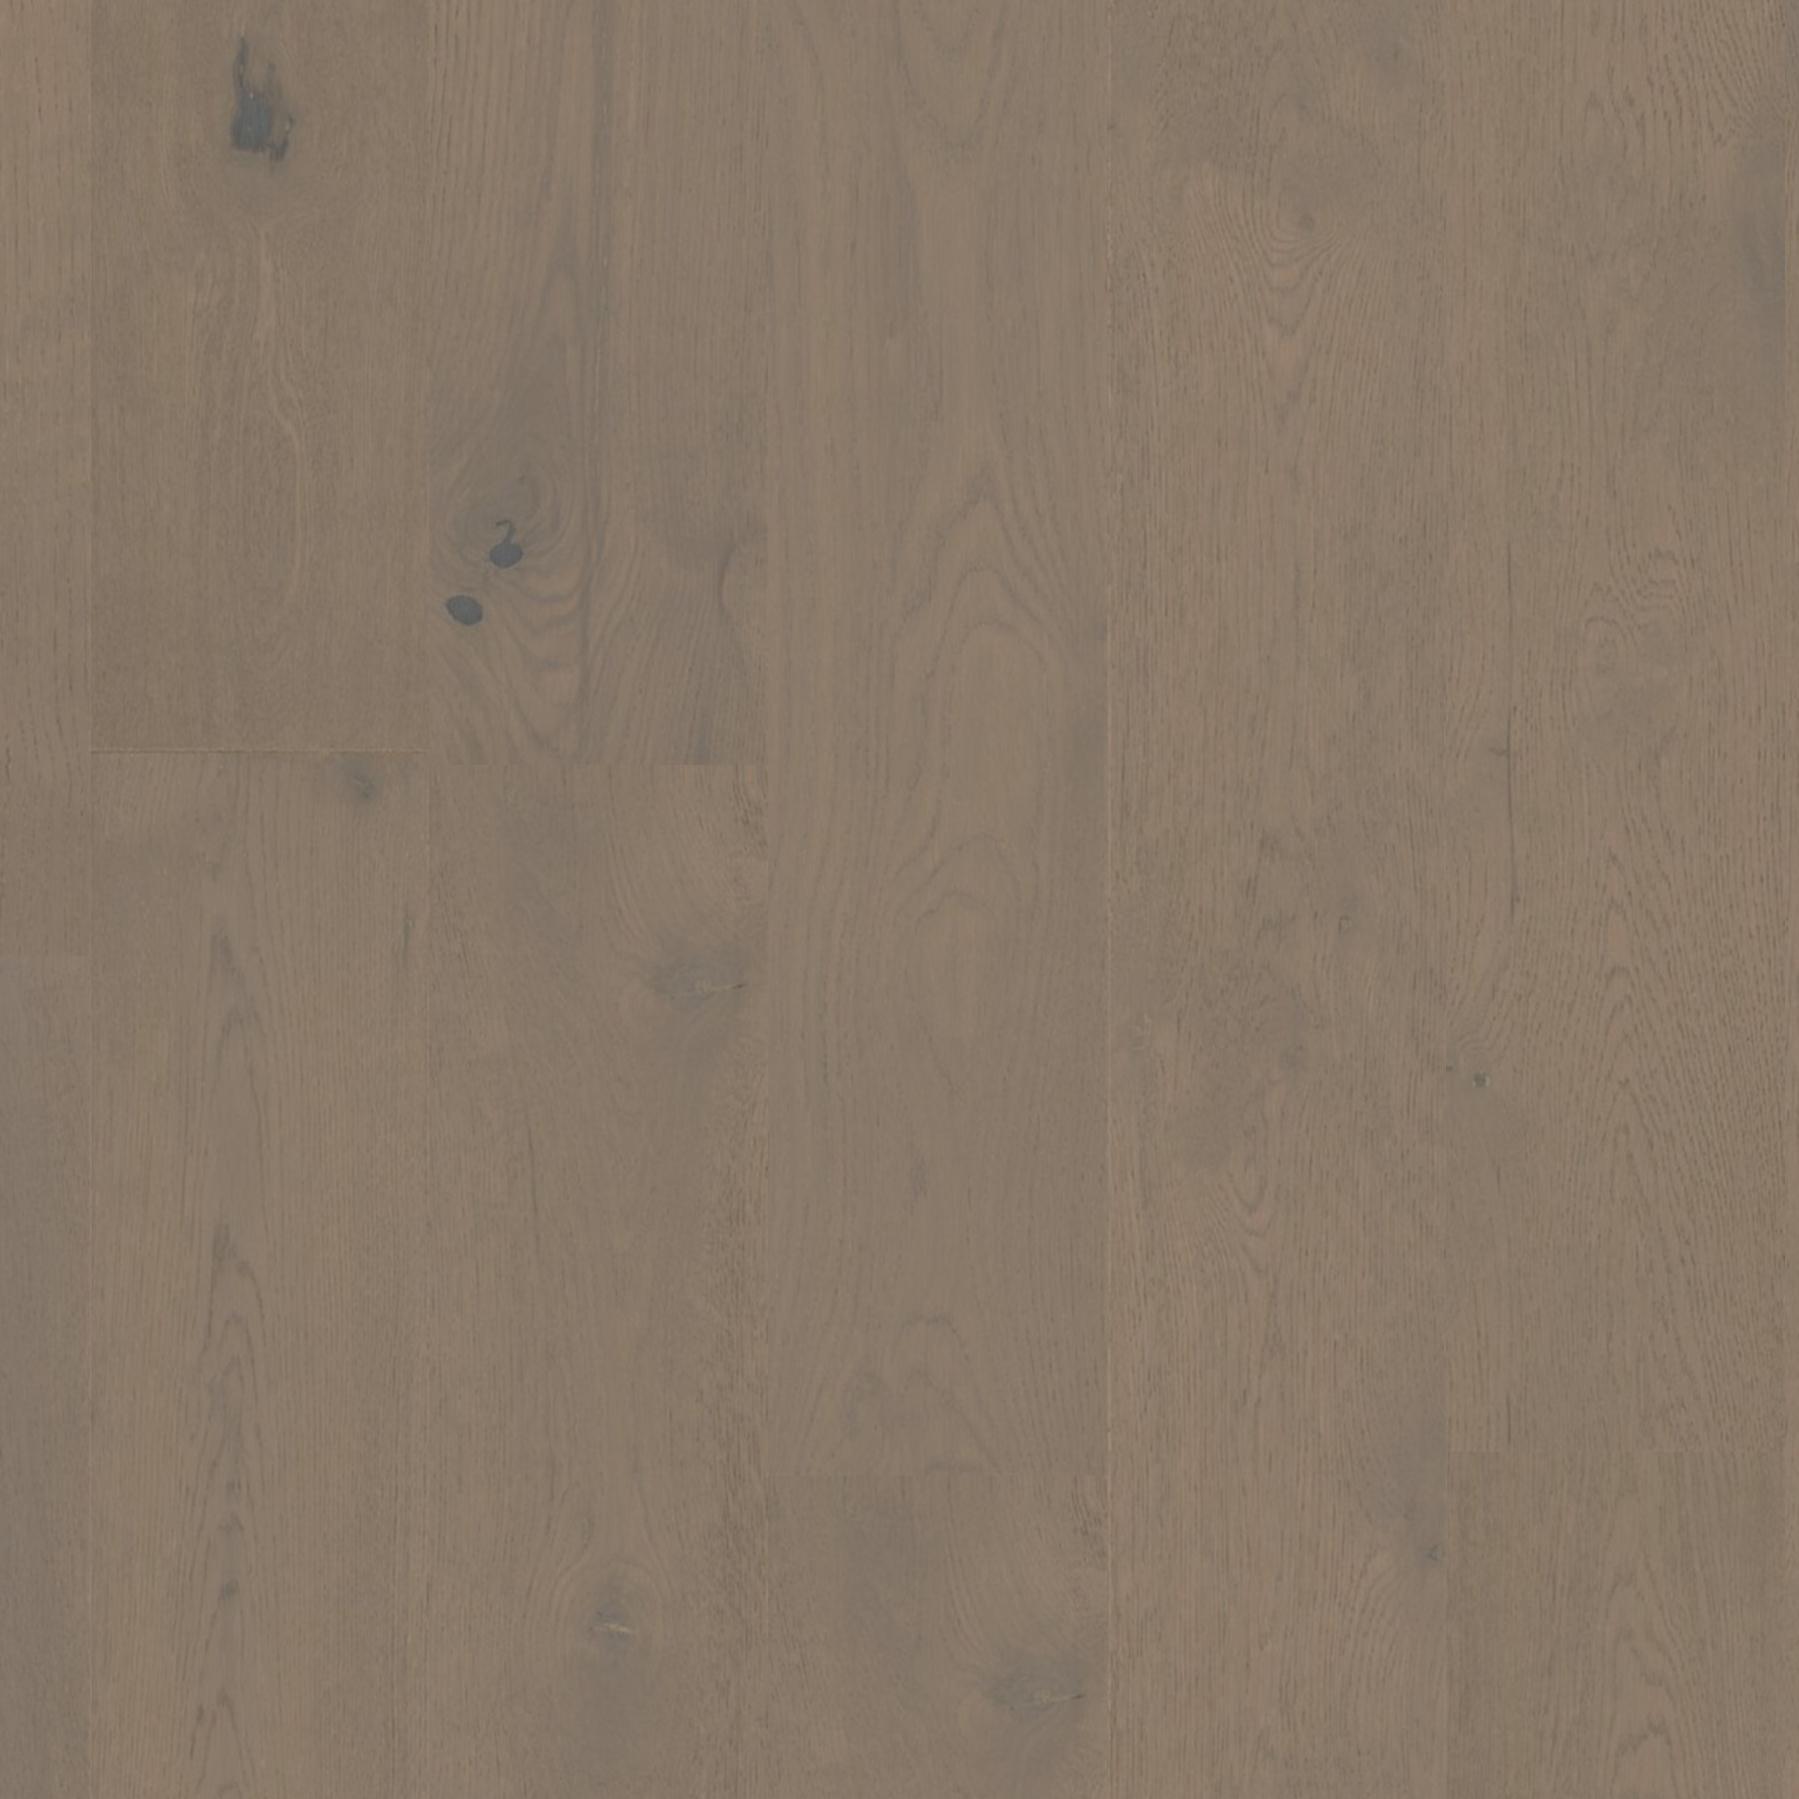 Stone Grey: Brushed & Matt Lacquered (2958)